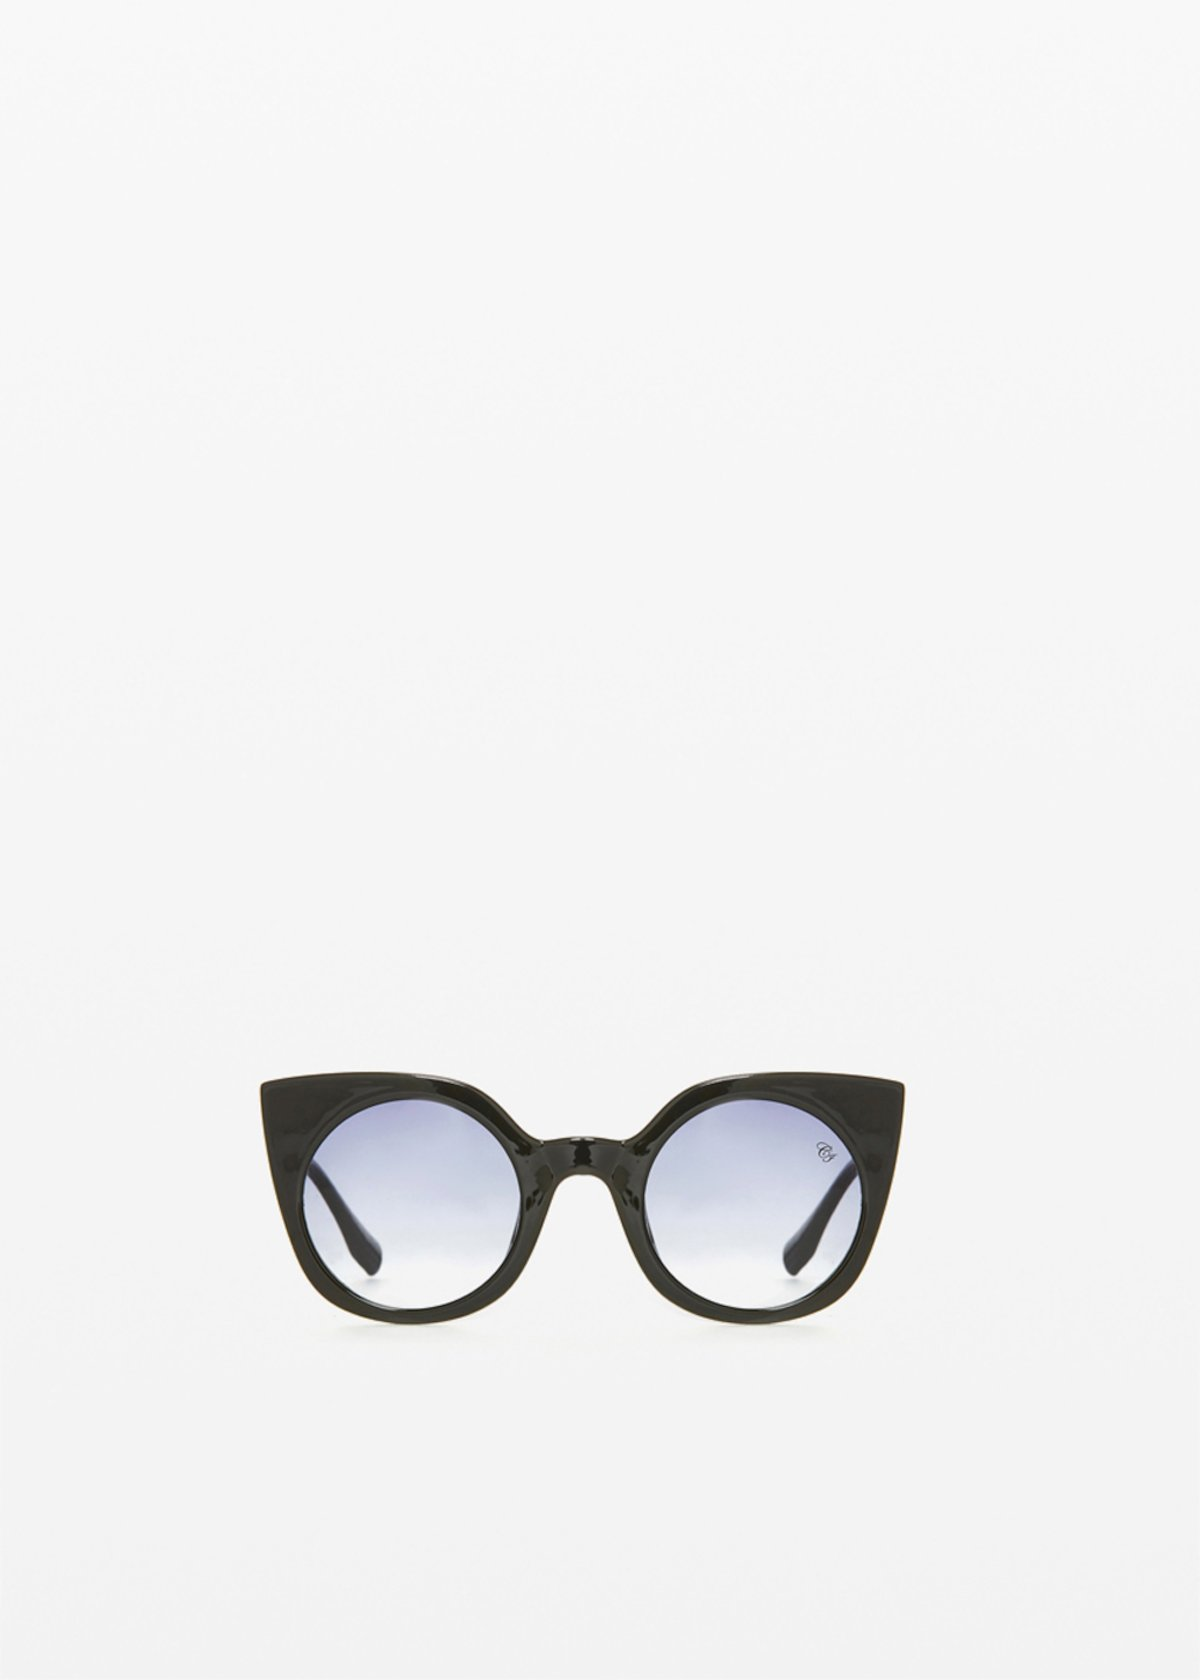 RFP-9904 Sunglasses animal print cat-eye model - Black - Woman